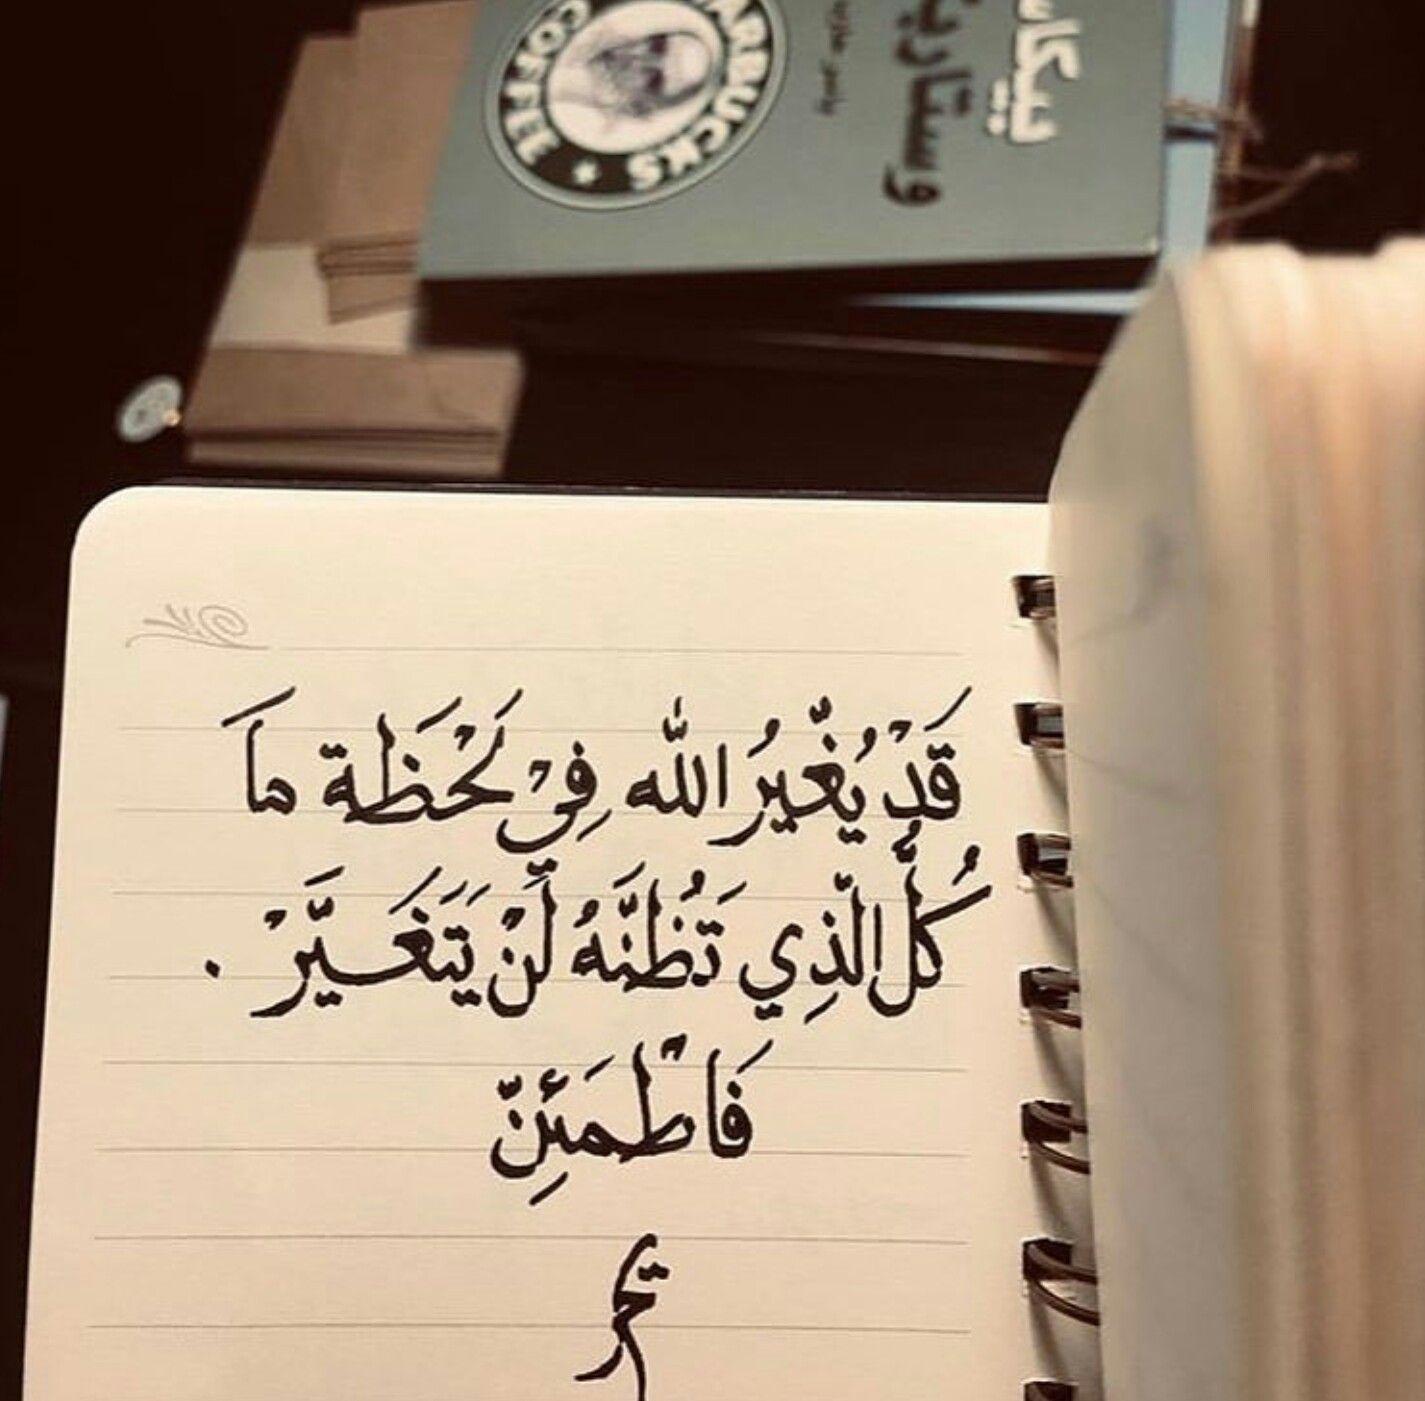 Pin By La Reina Aya On كتابه على الورق Happy Life Quotes Arabic Quotes Words